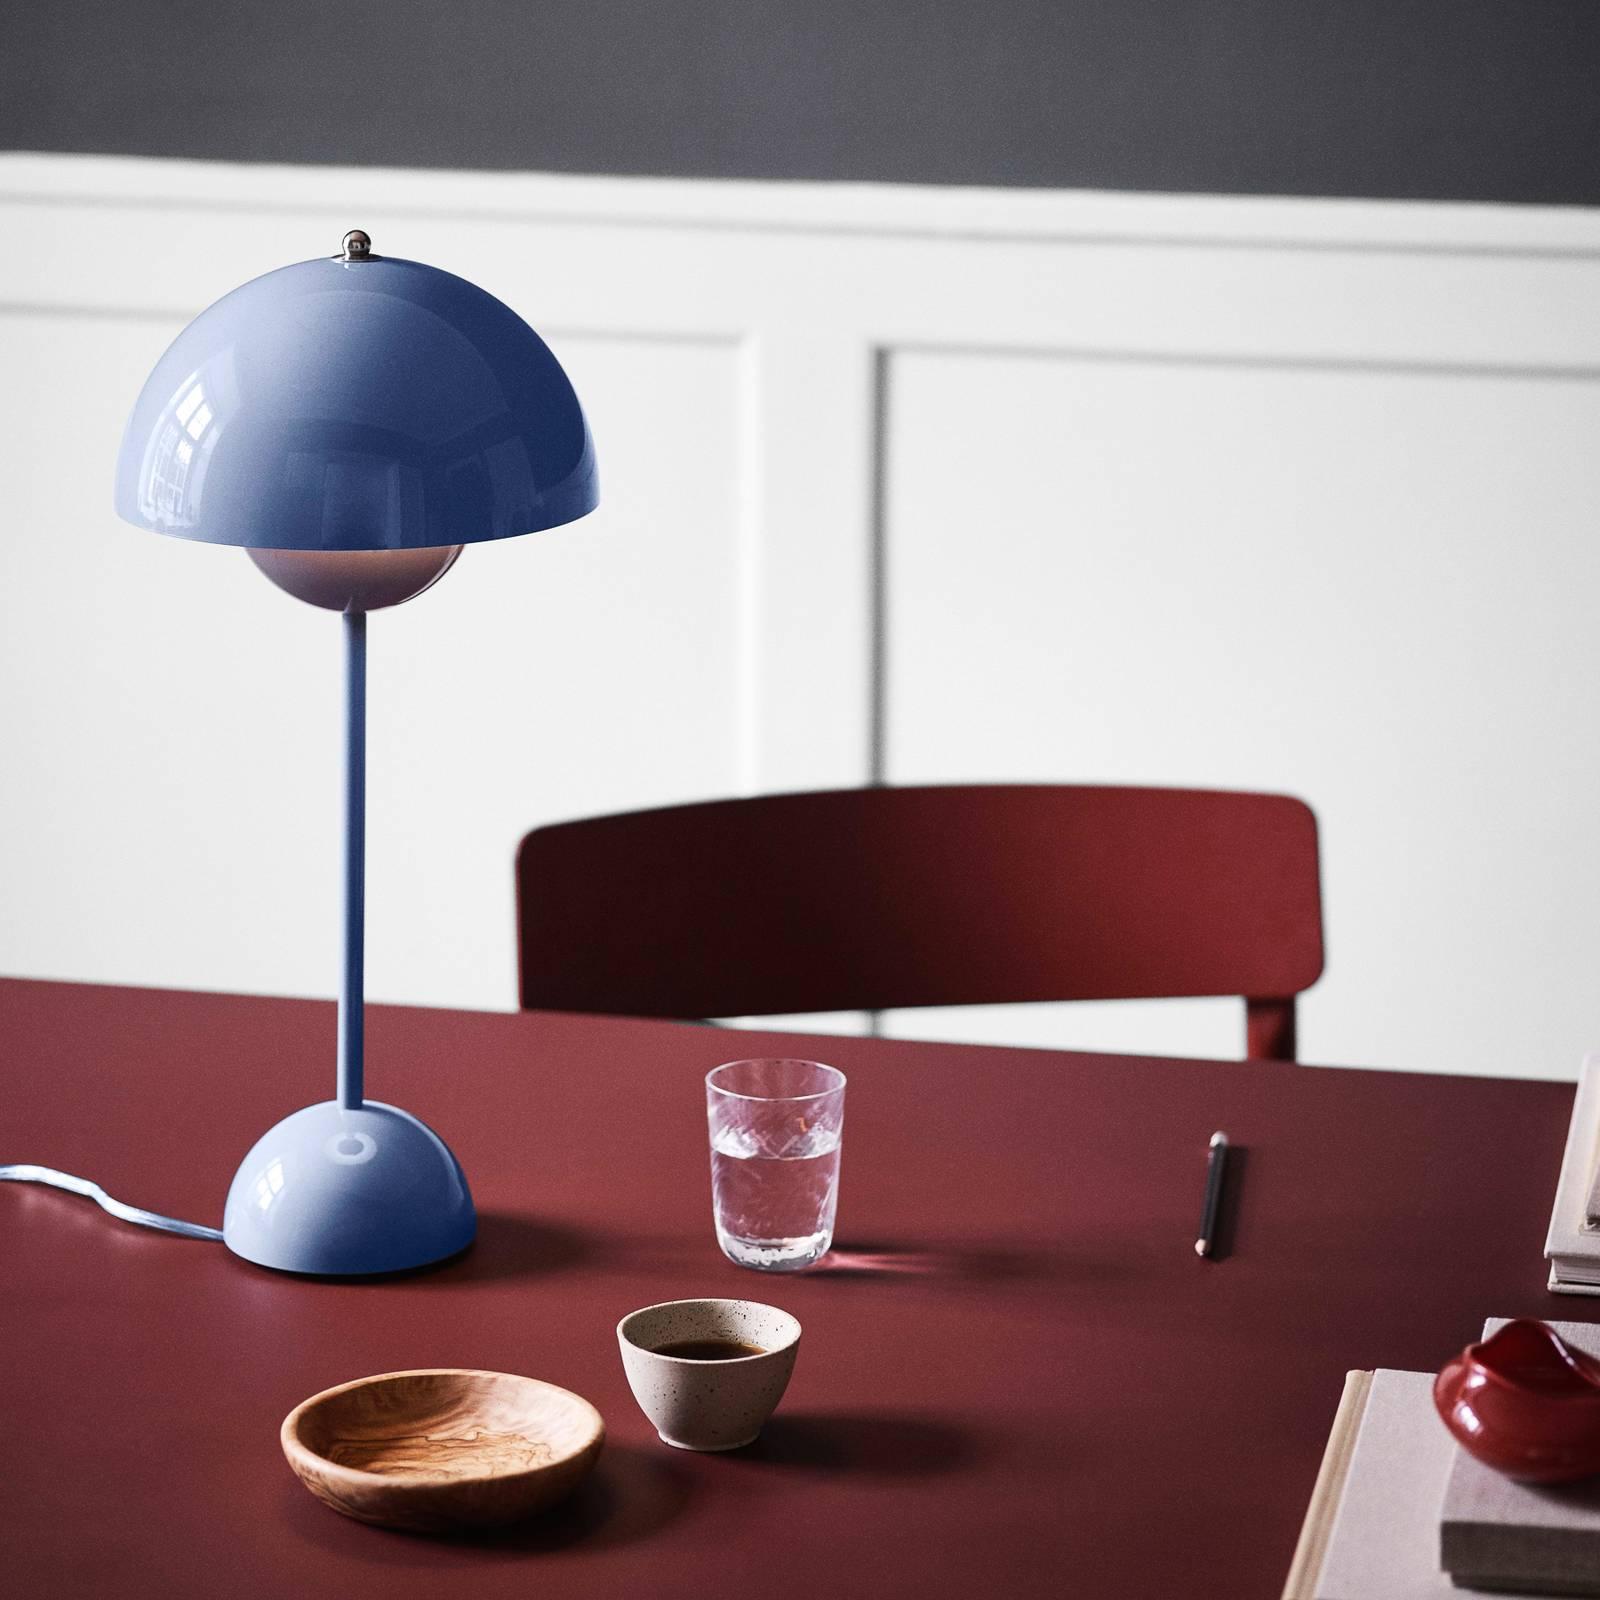 &Tradition Flowerpot VP3 -pöytälamppu, sininen